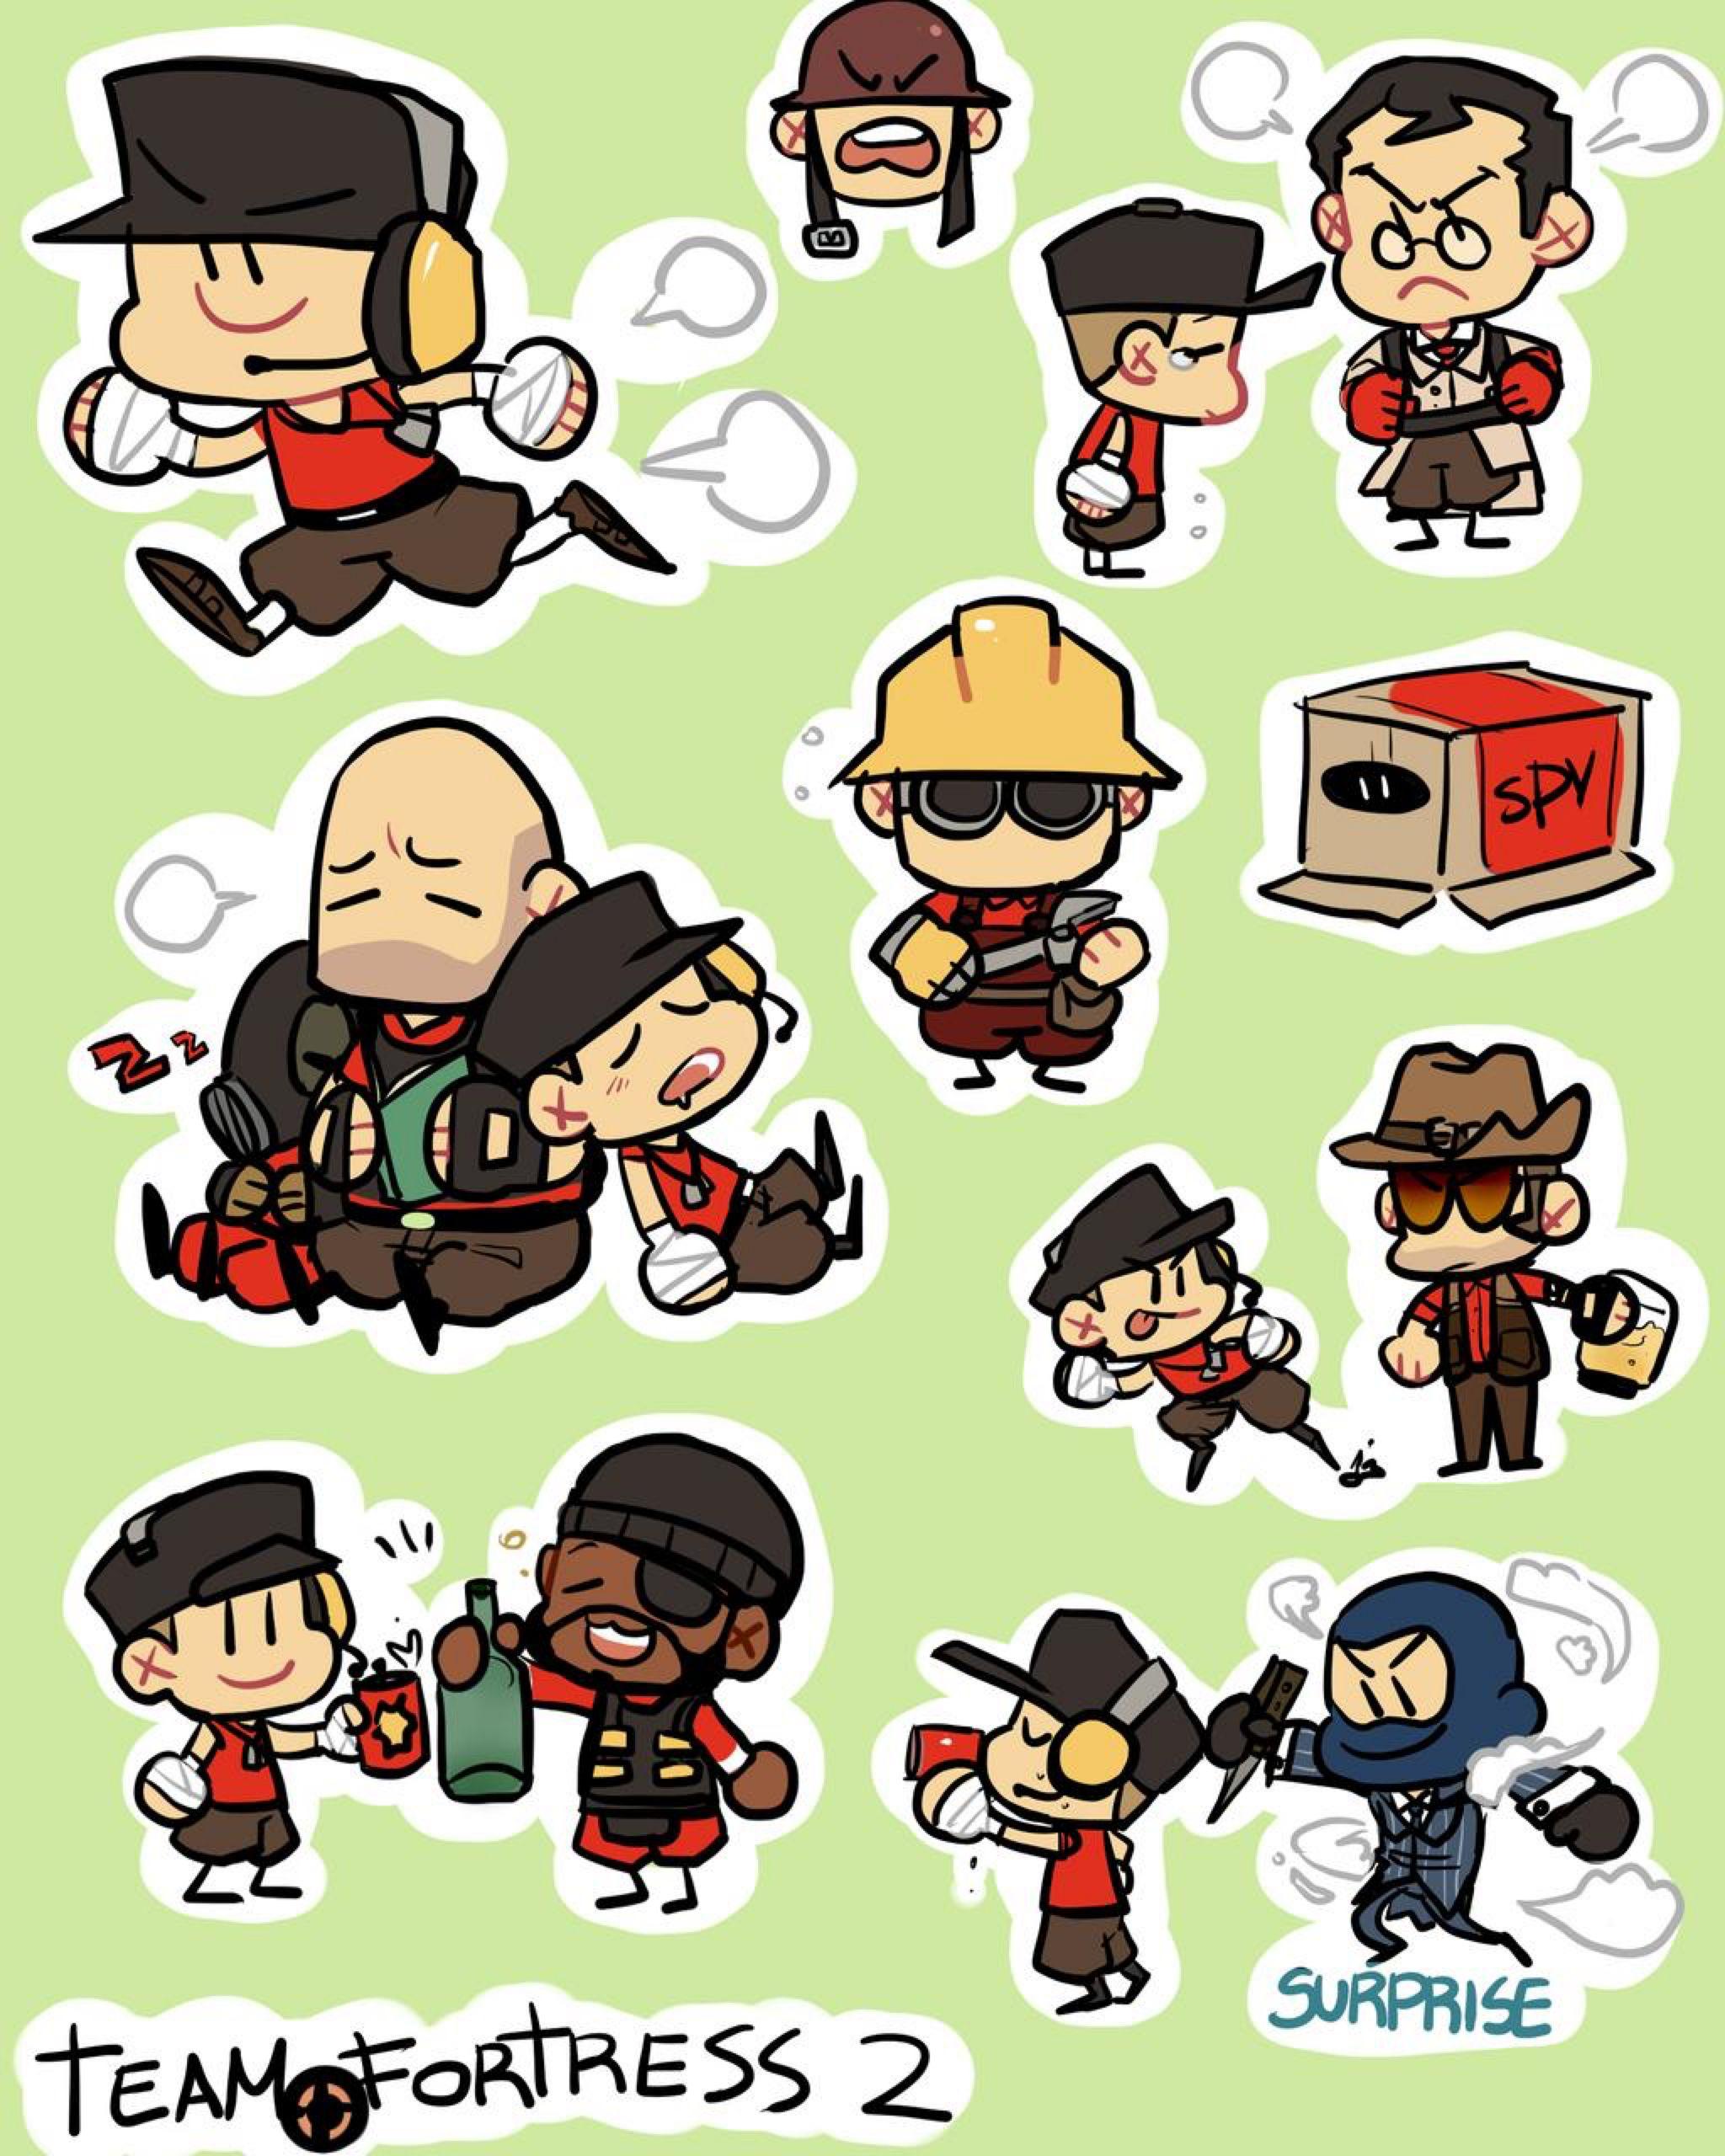 Chibi Style By Konniwa On Deviantart Team Fortress 2 Team